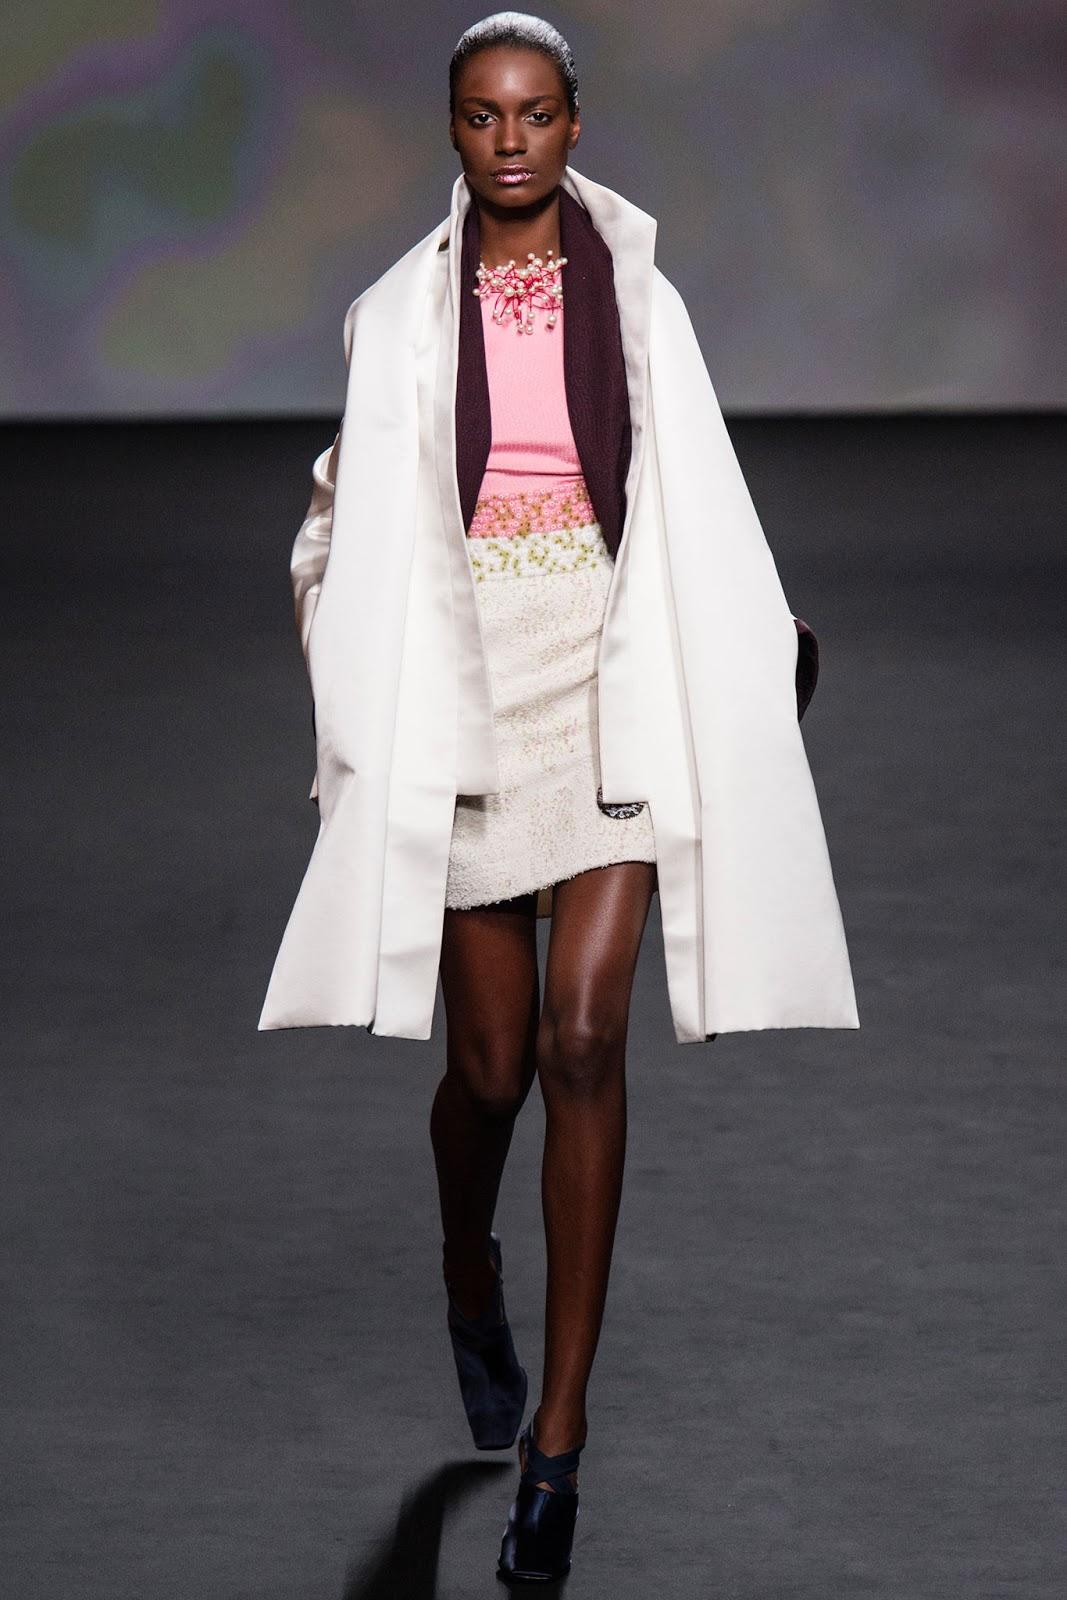 CHRISTIAN DIOR HAUTE COUTURE FALL WINTER 2014 (36)  Christian Dior Haute Couture 2014